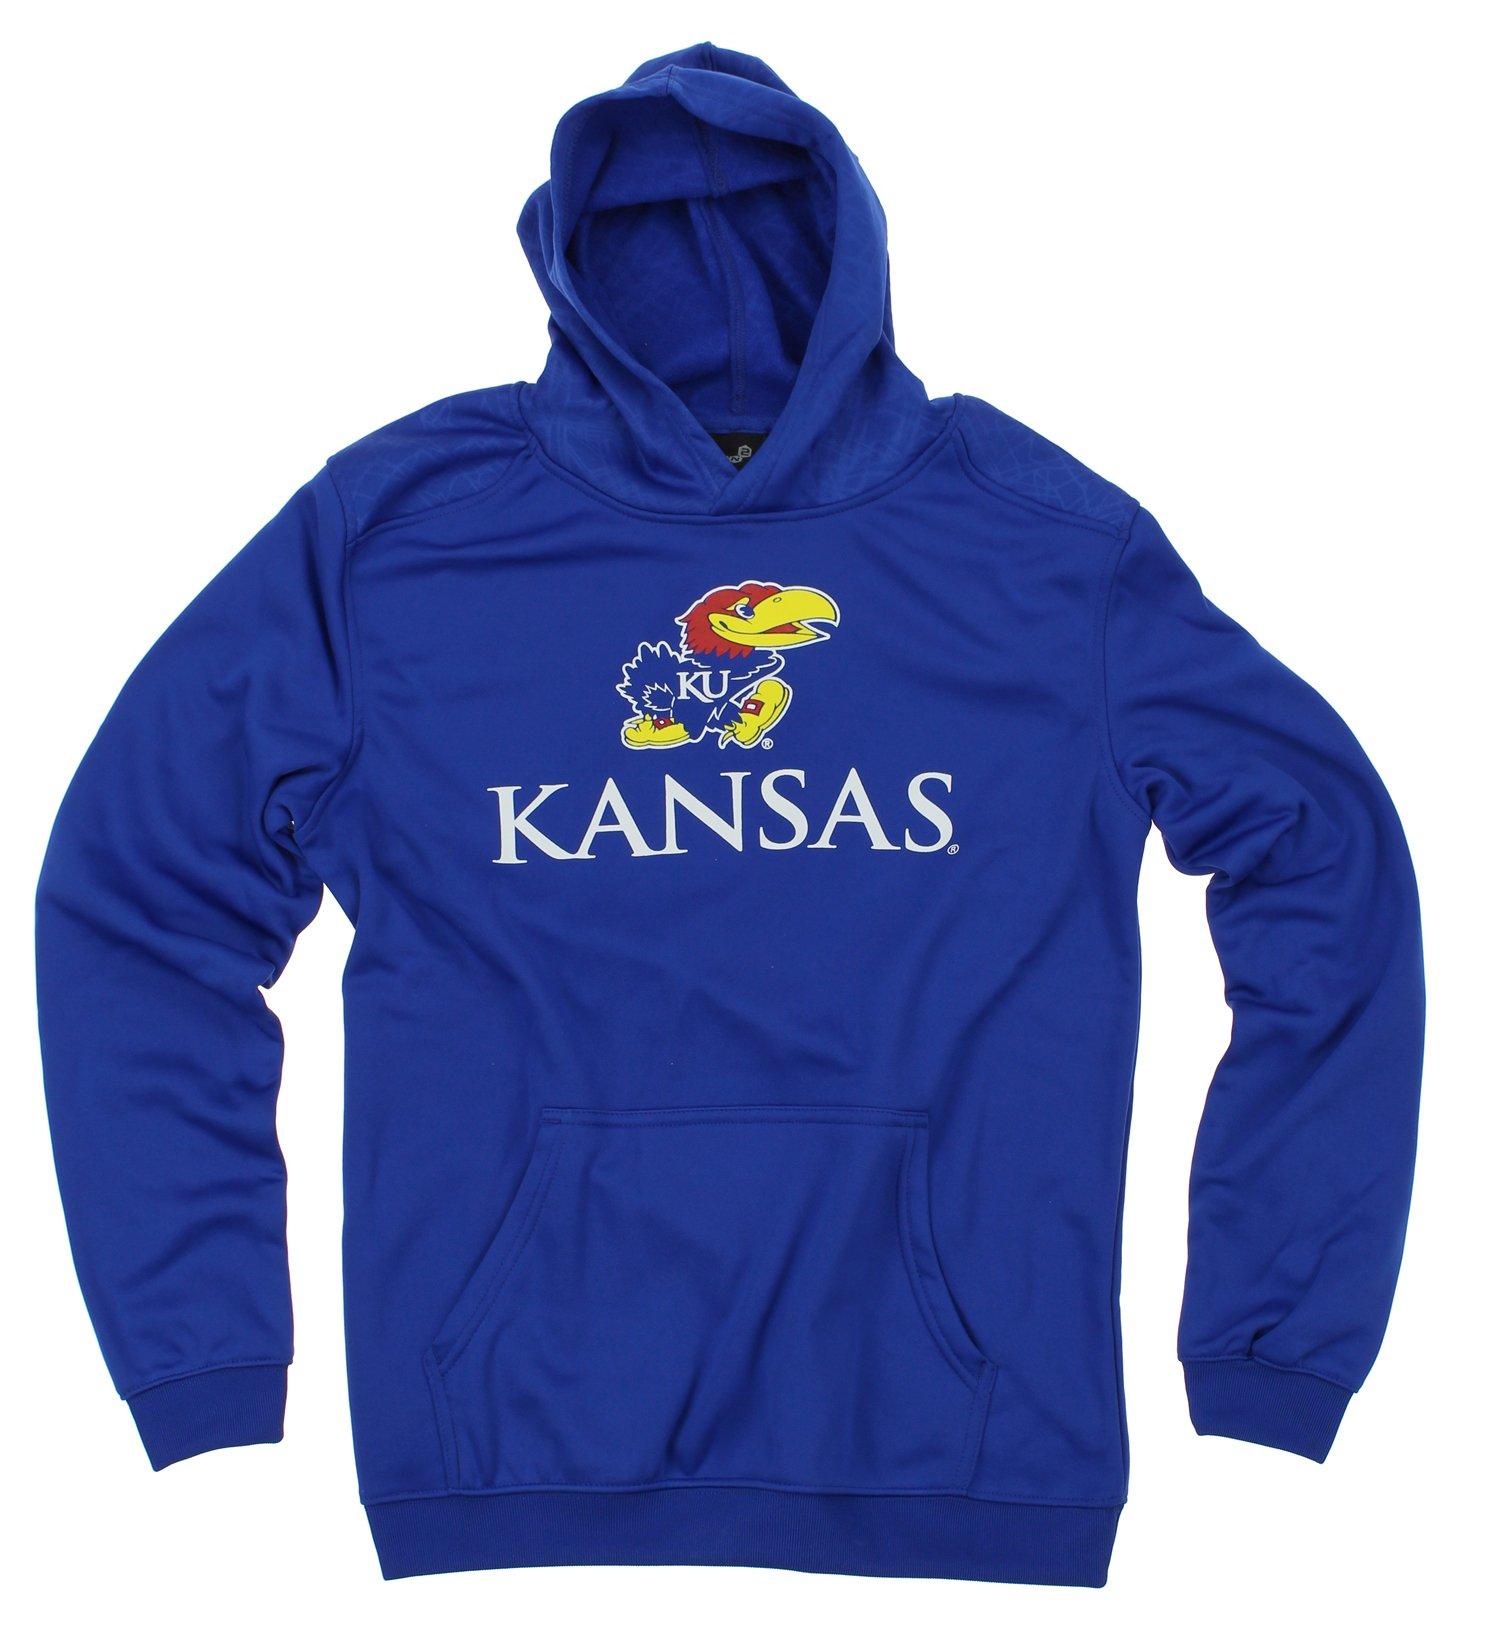 NCAA Youth Kansas Jayhawks Performance Hoodie, Blue